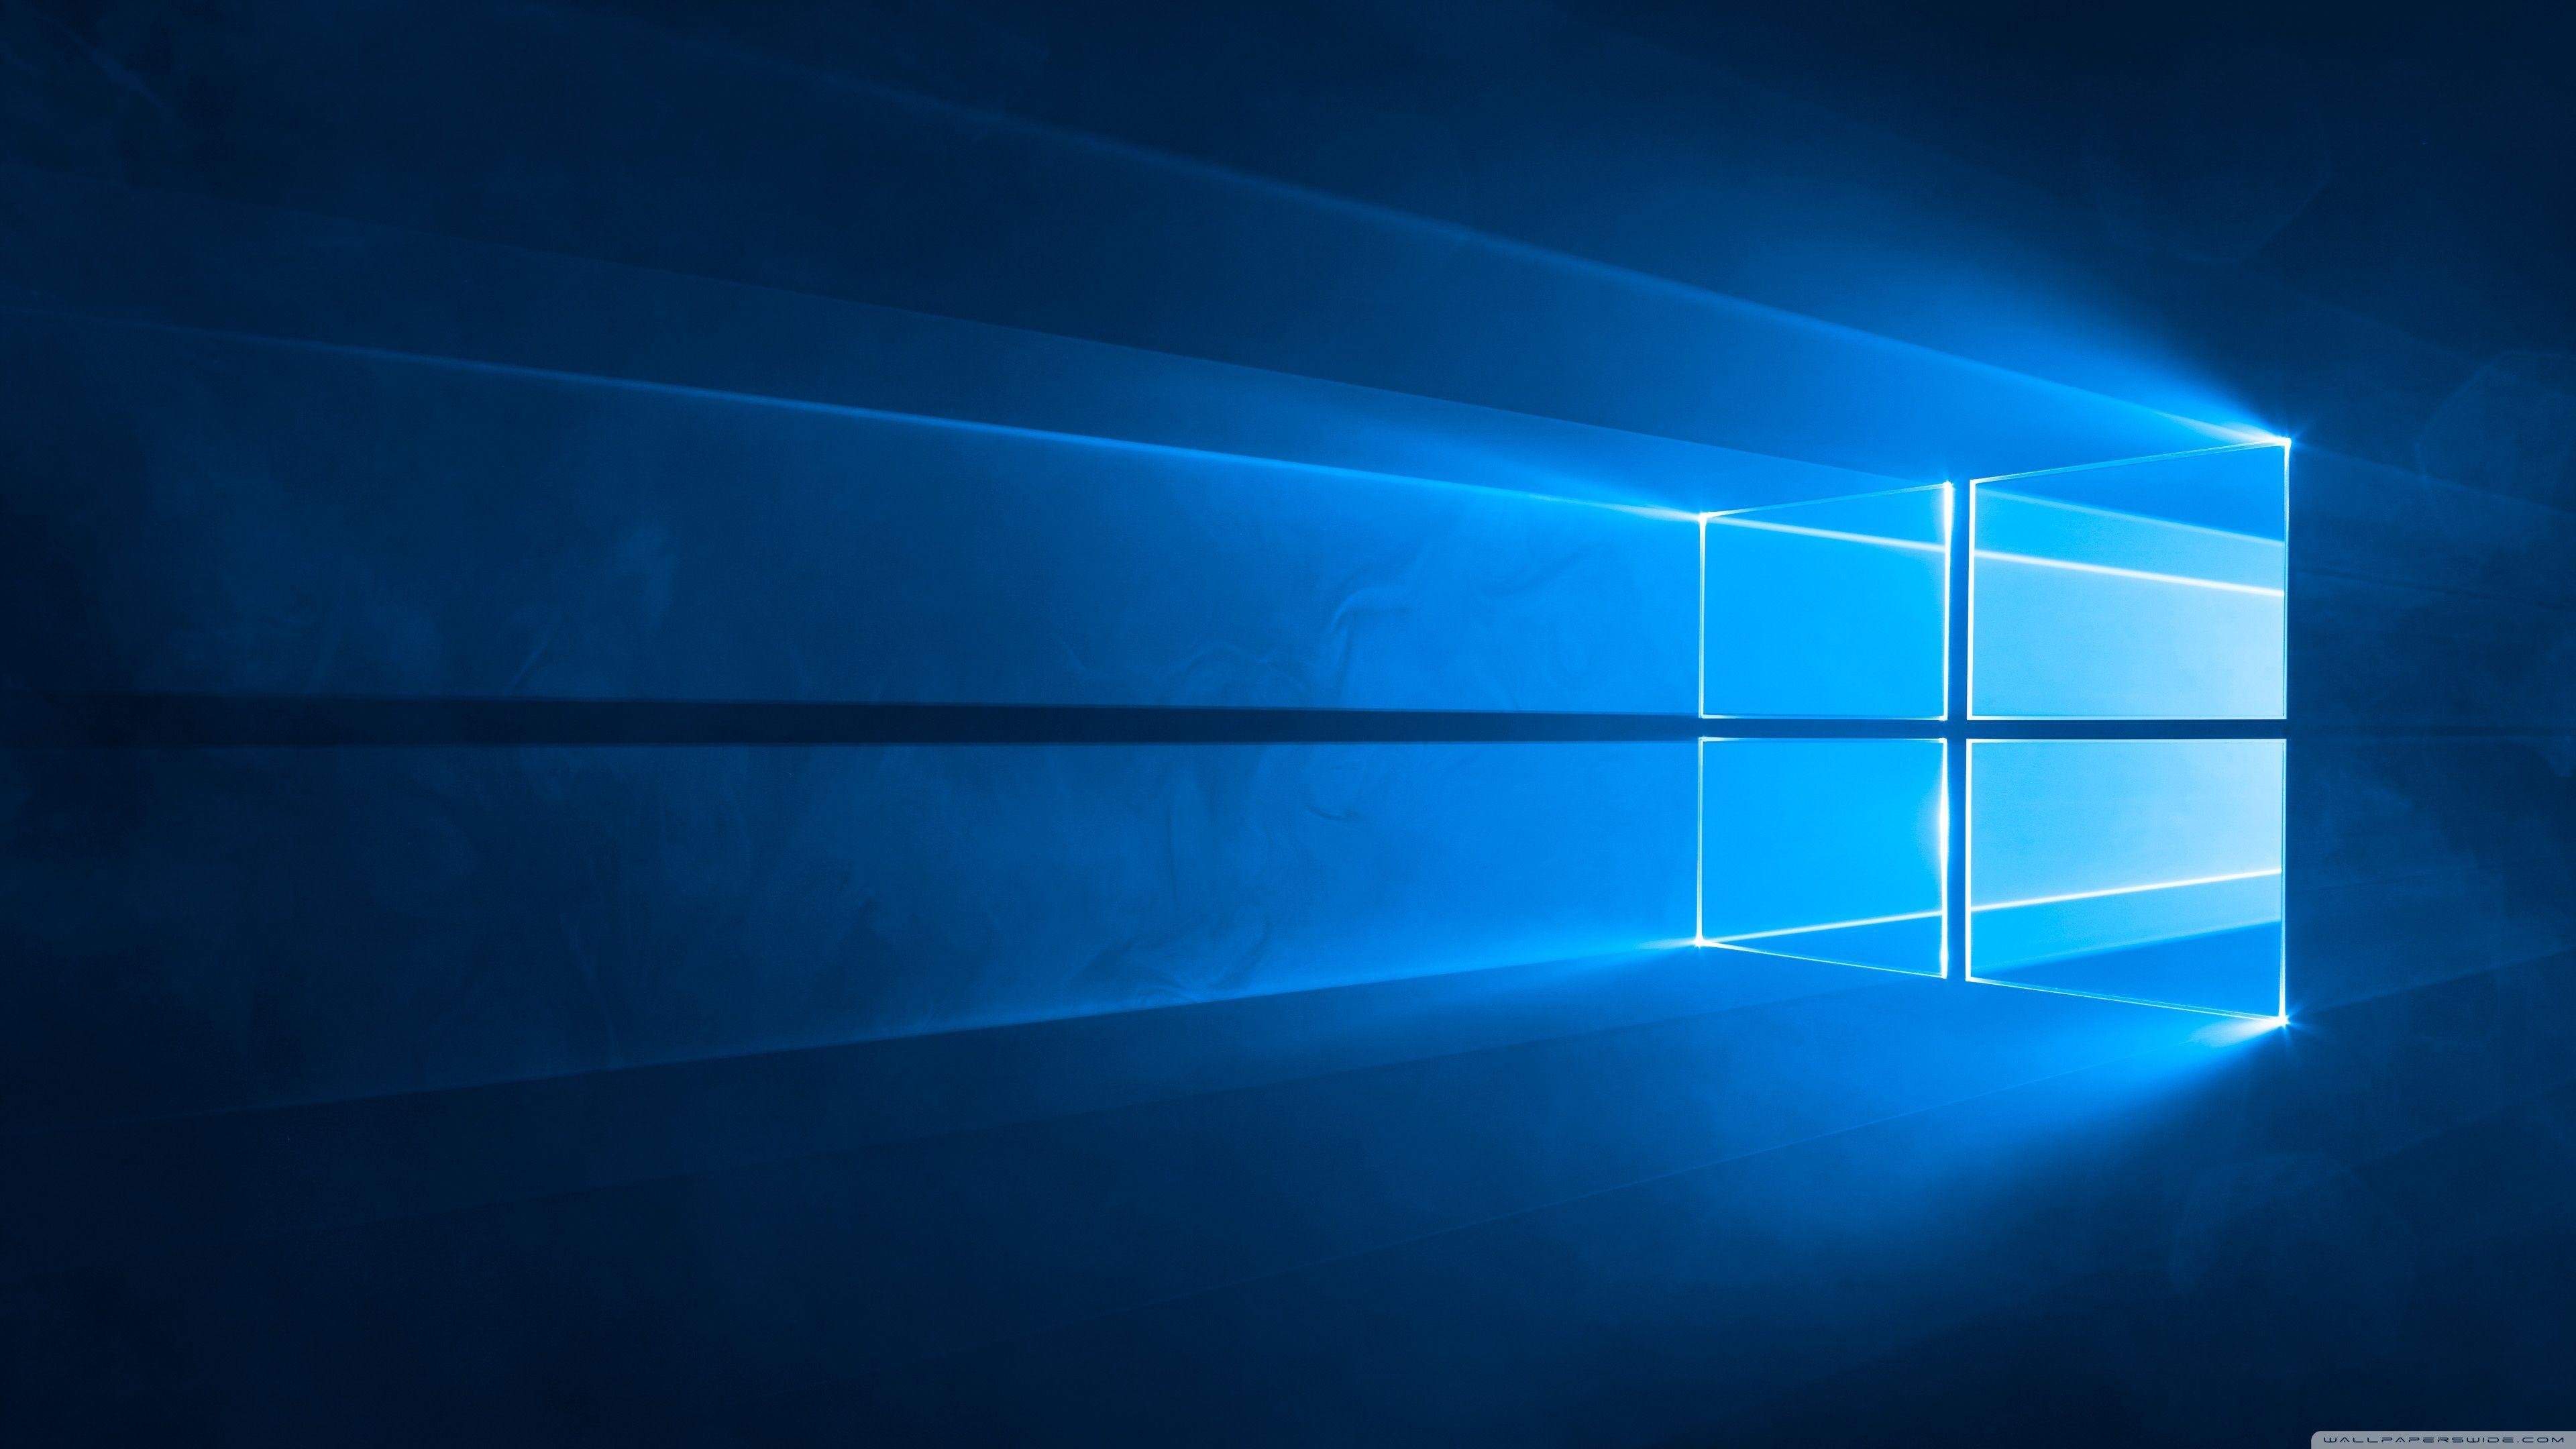 Windows 10 Hd Wallpapers Top Free Windows 10 Hd